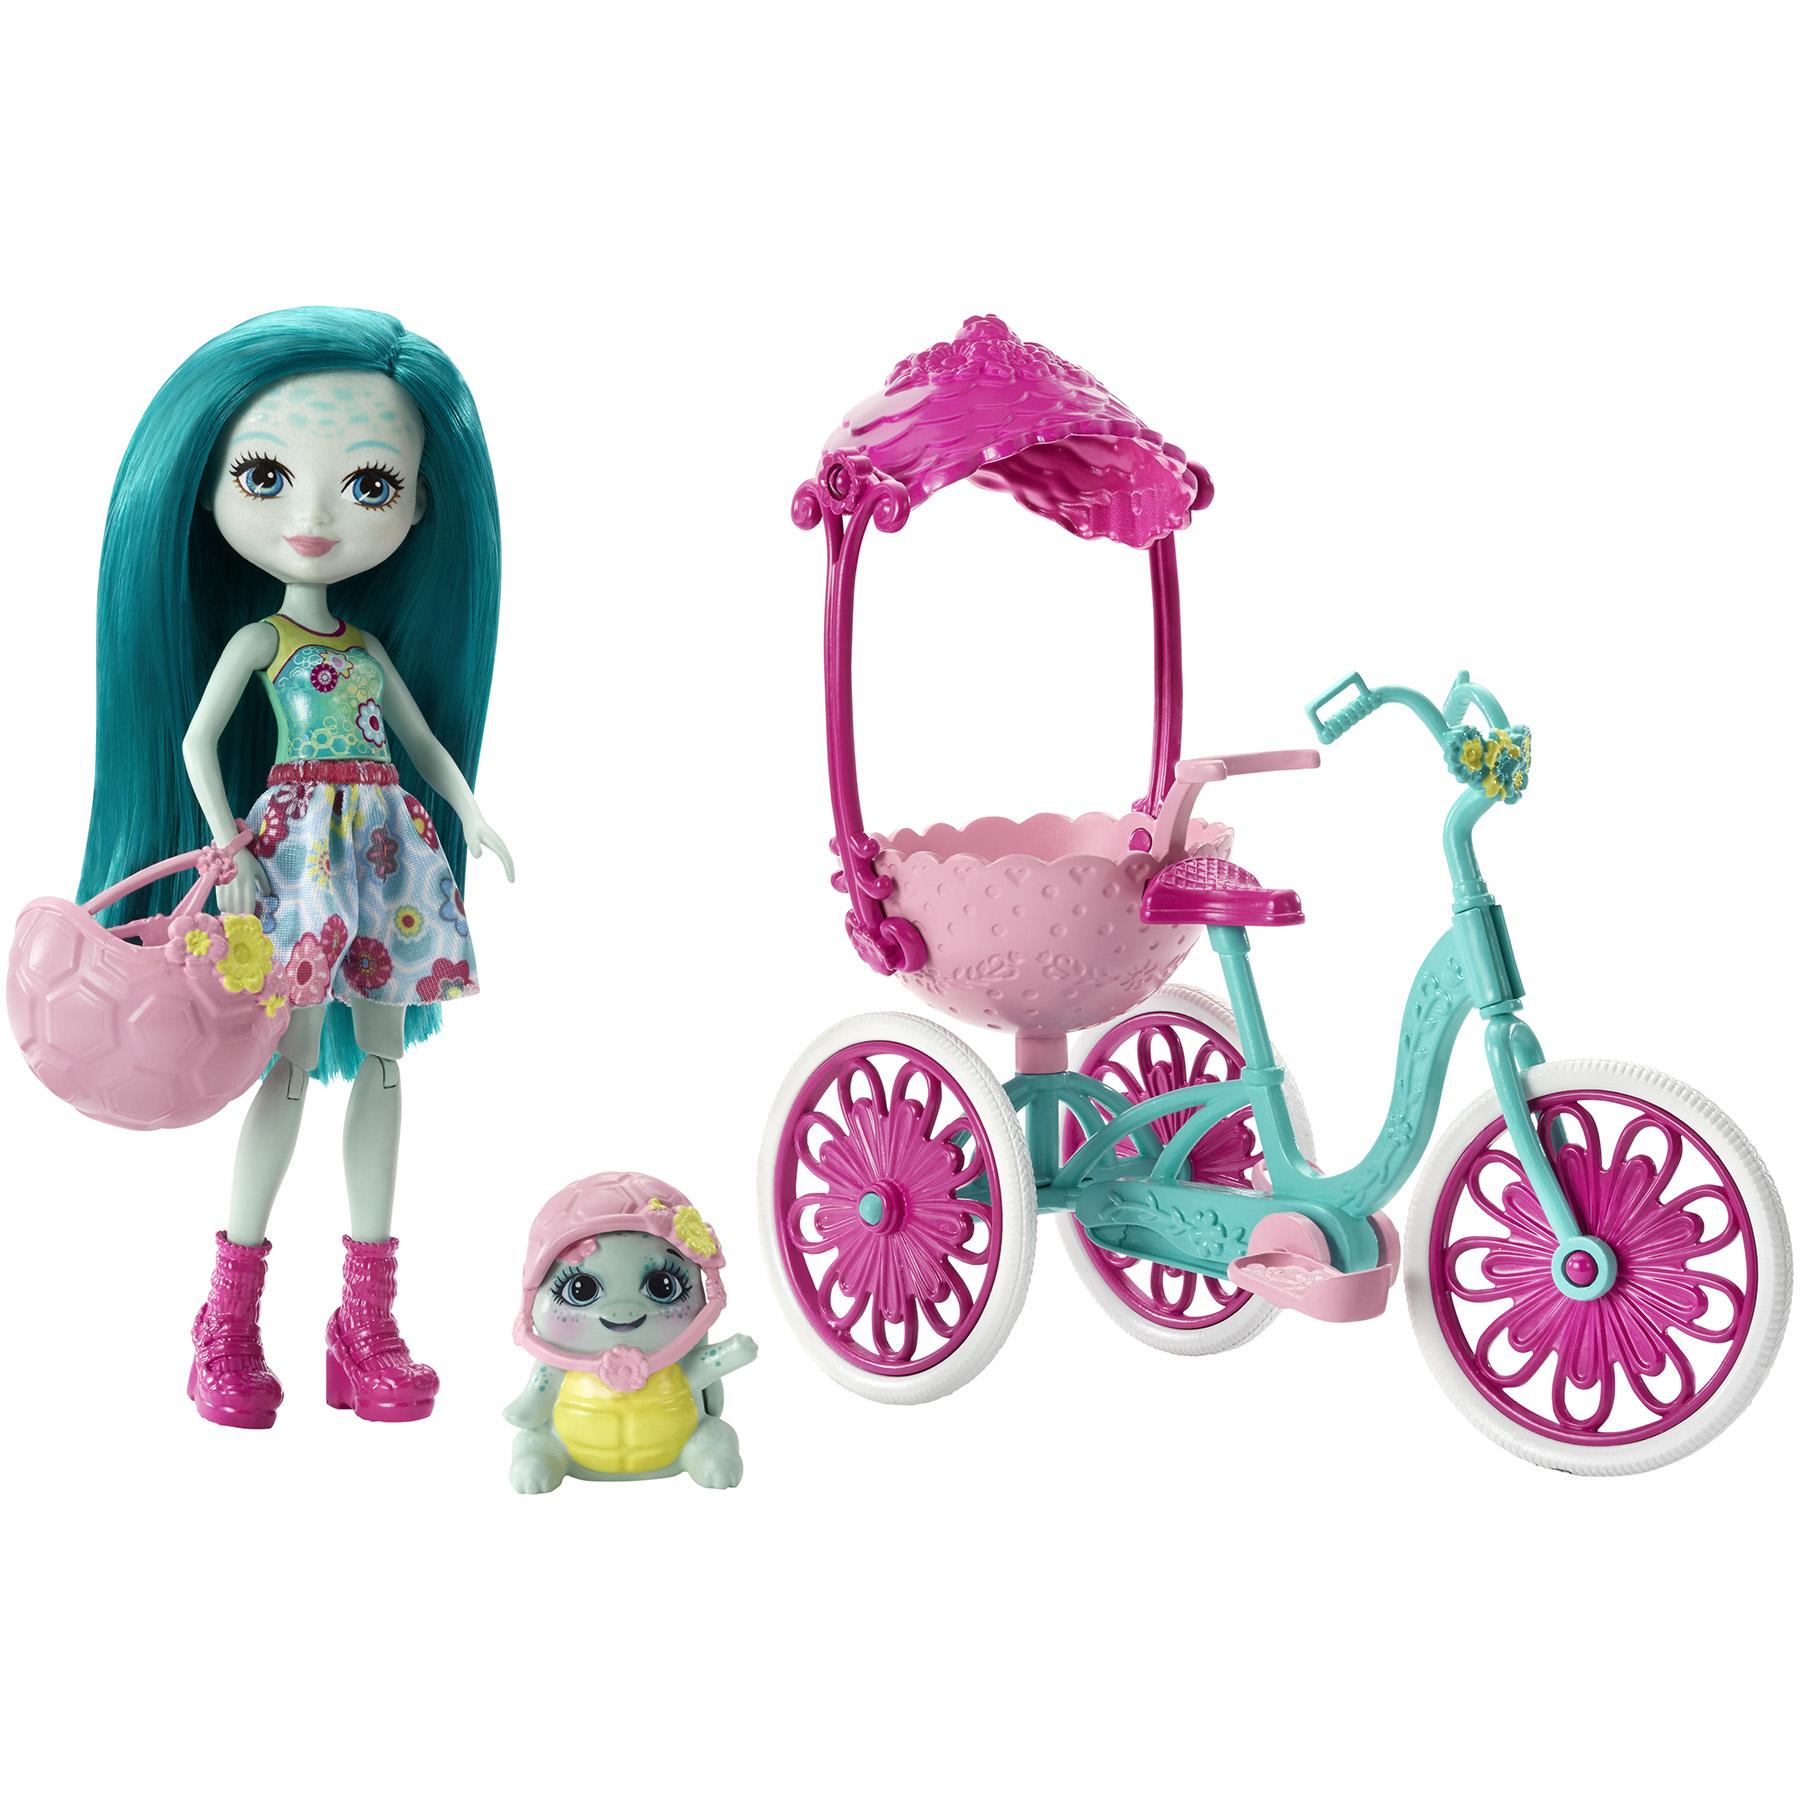 Mattel Enchantimalsa Built For Two Doll Set Doll Sets Dolls